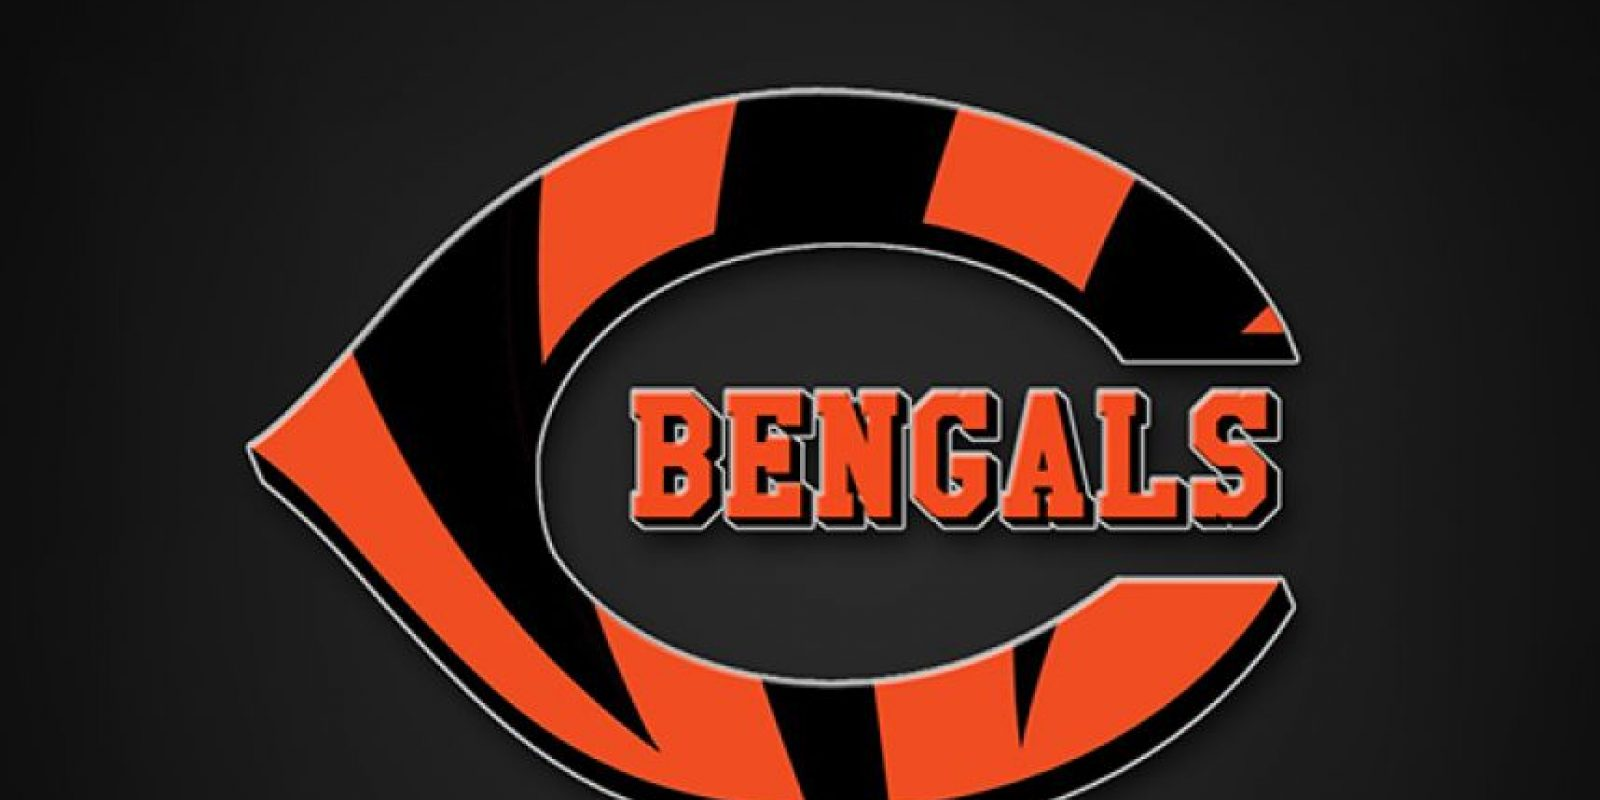 Cincinatti Bengals y Cincinatti Bengals Foto:DailySnark